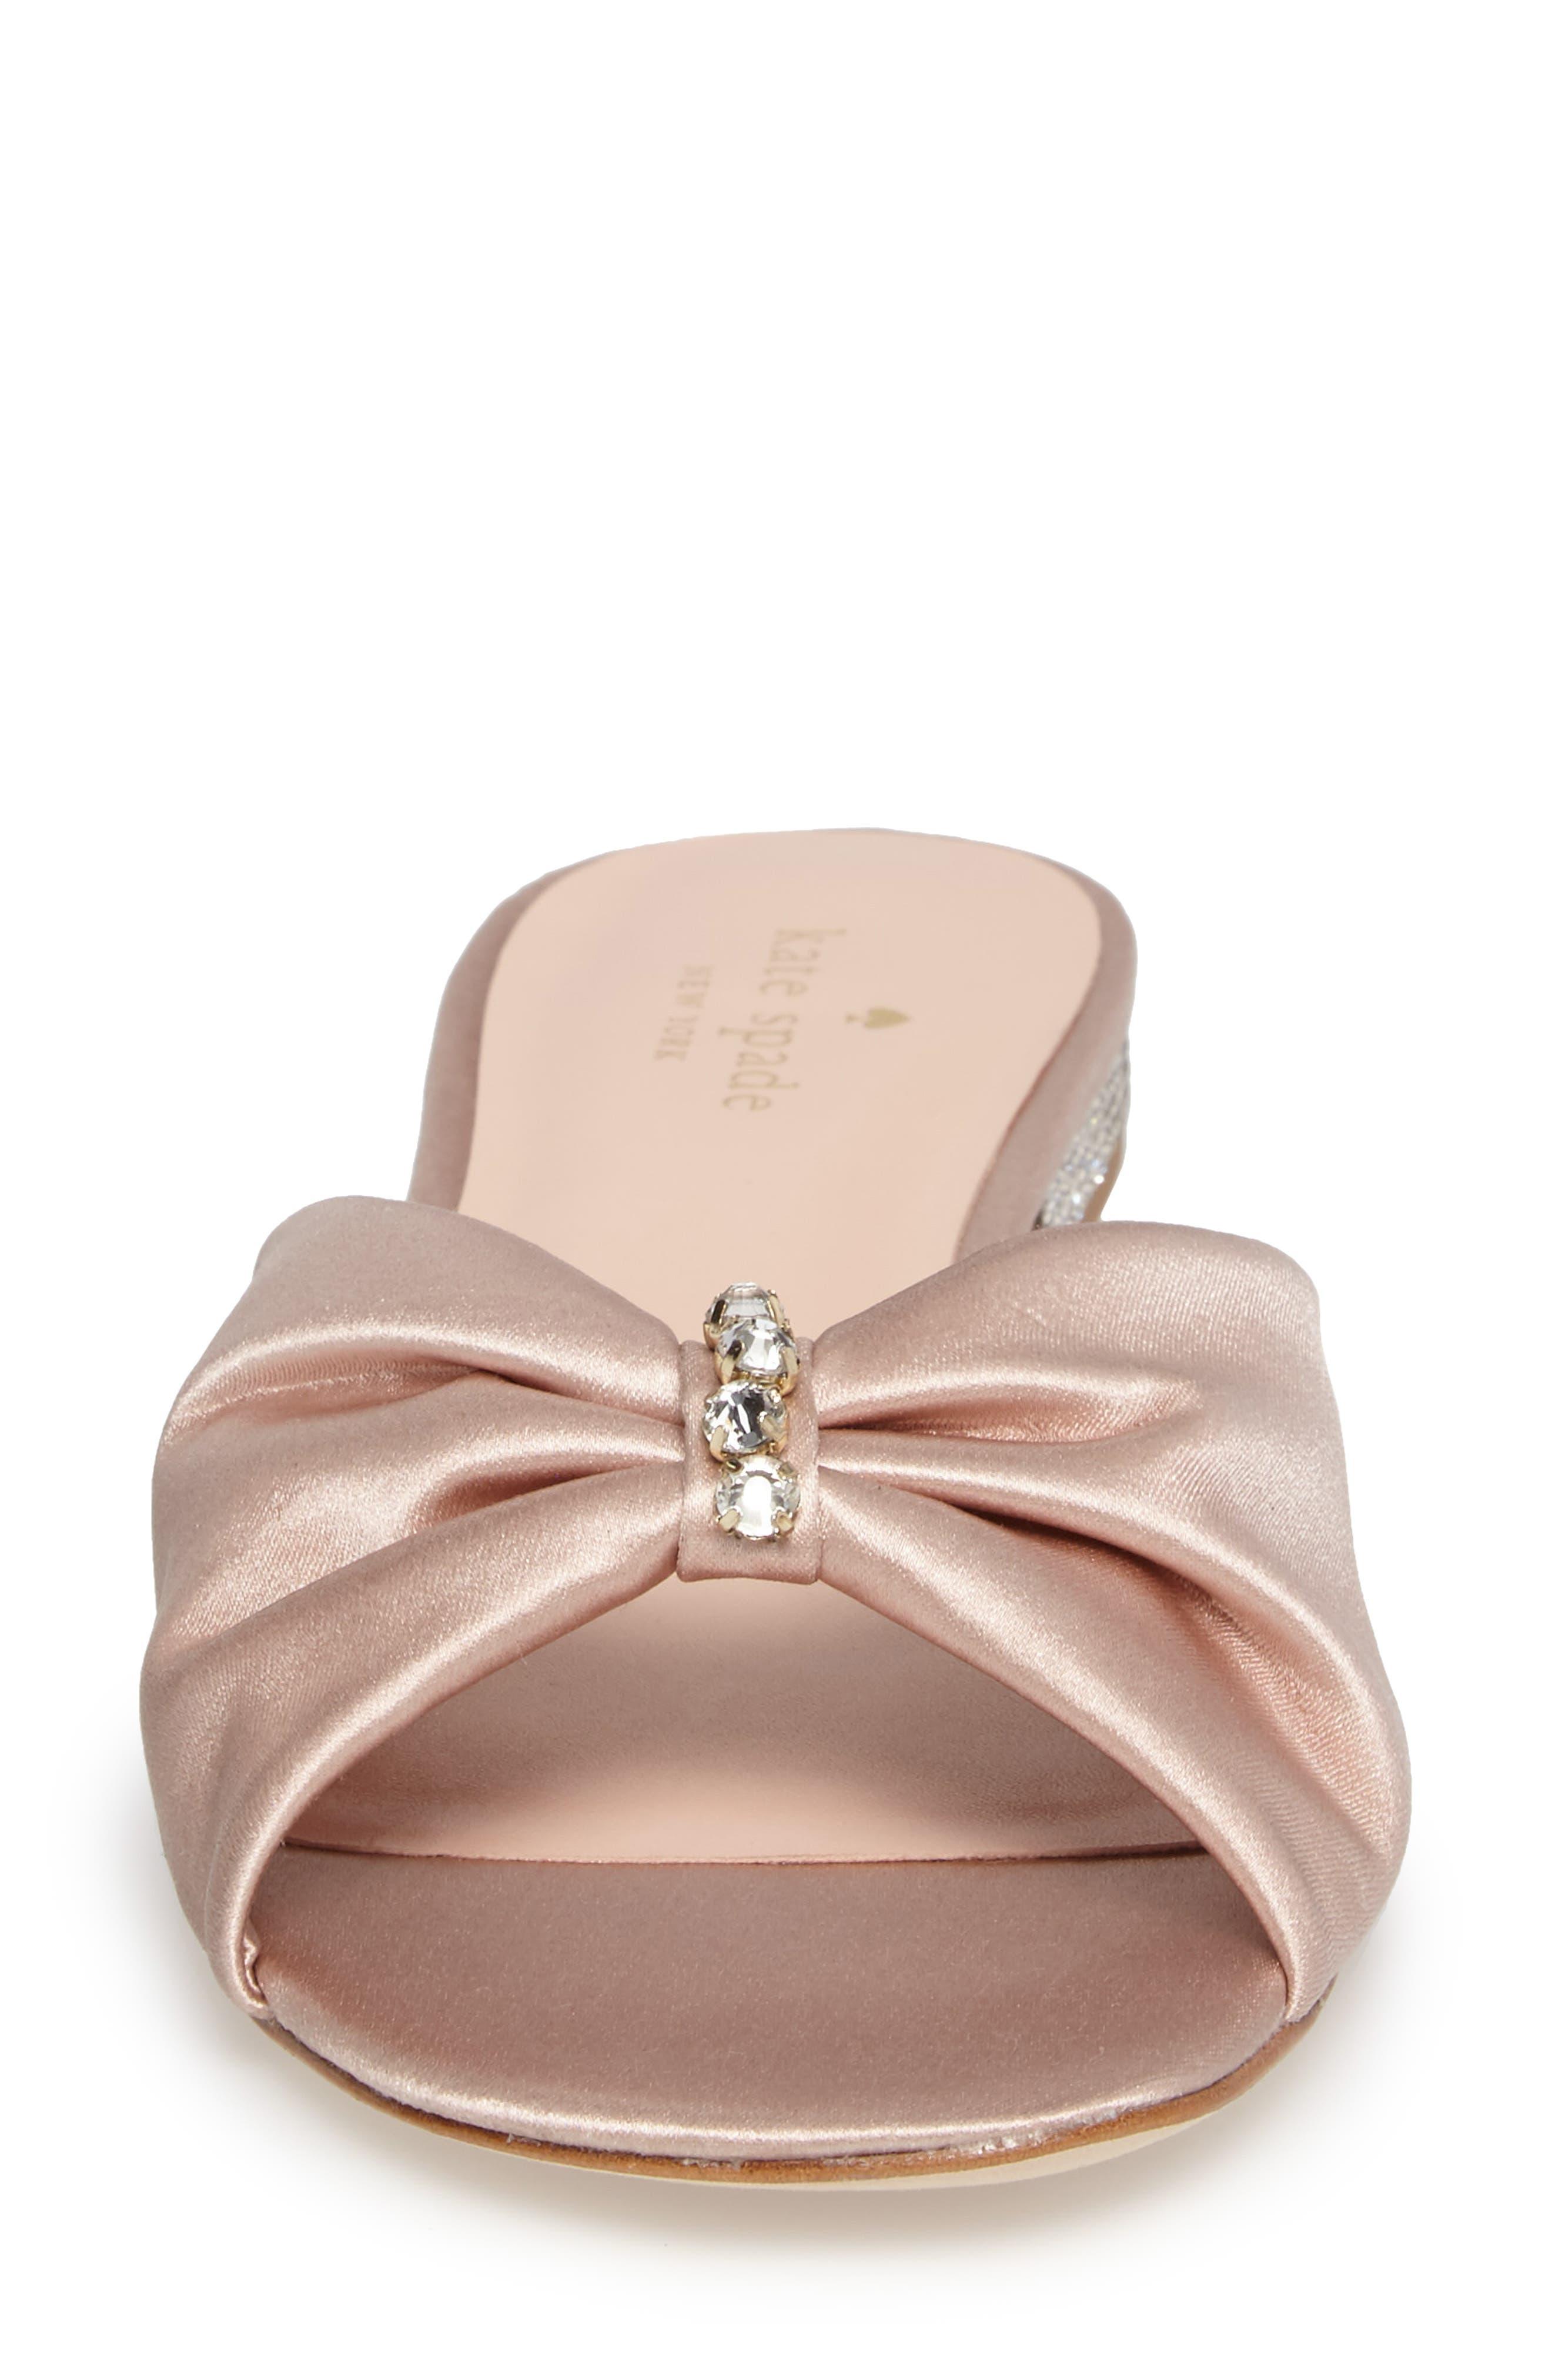 fenton slide sandal,                             Alternate thumbnail 4, color,                             Pink Champagne